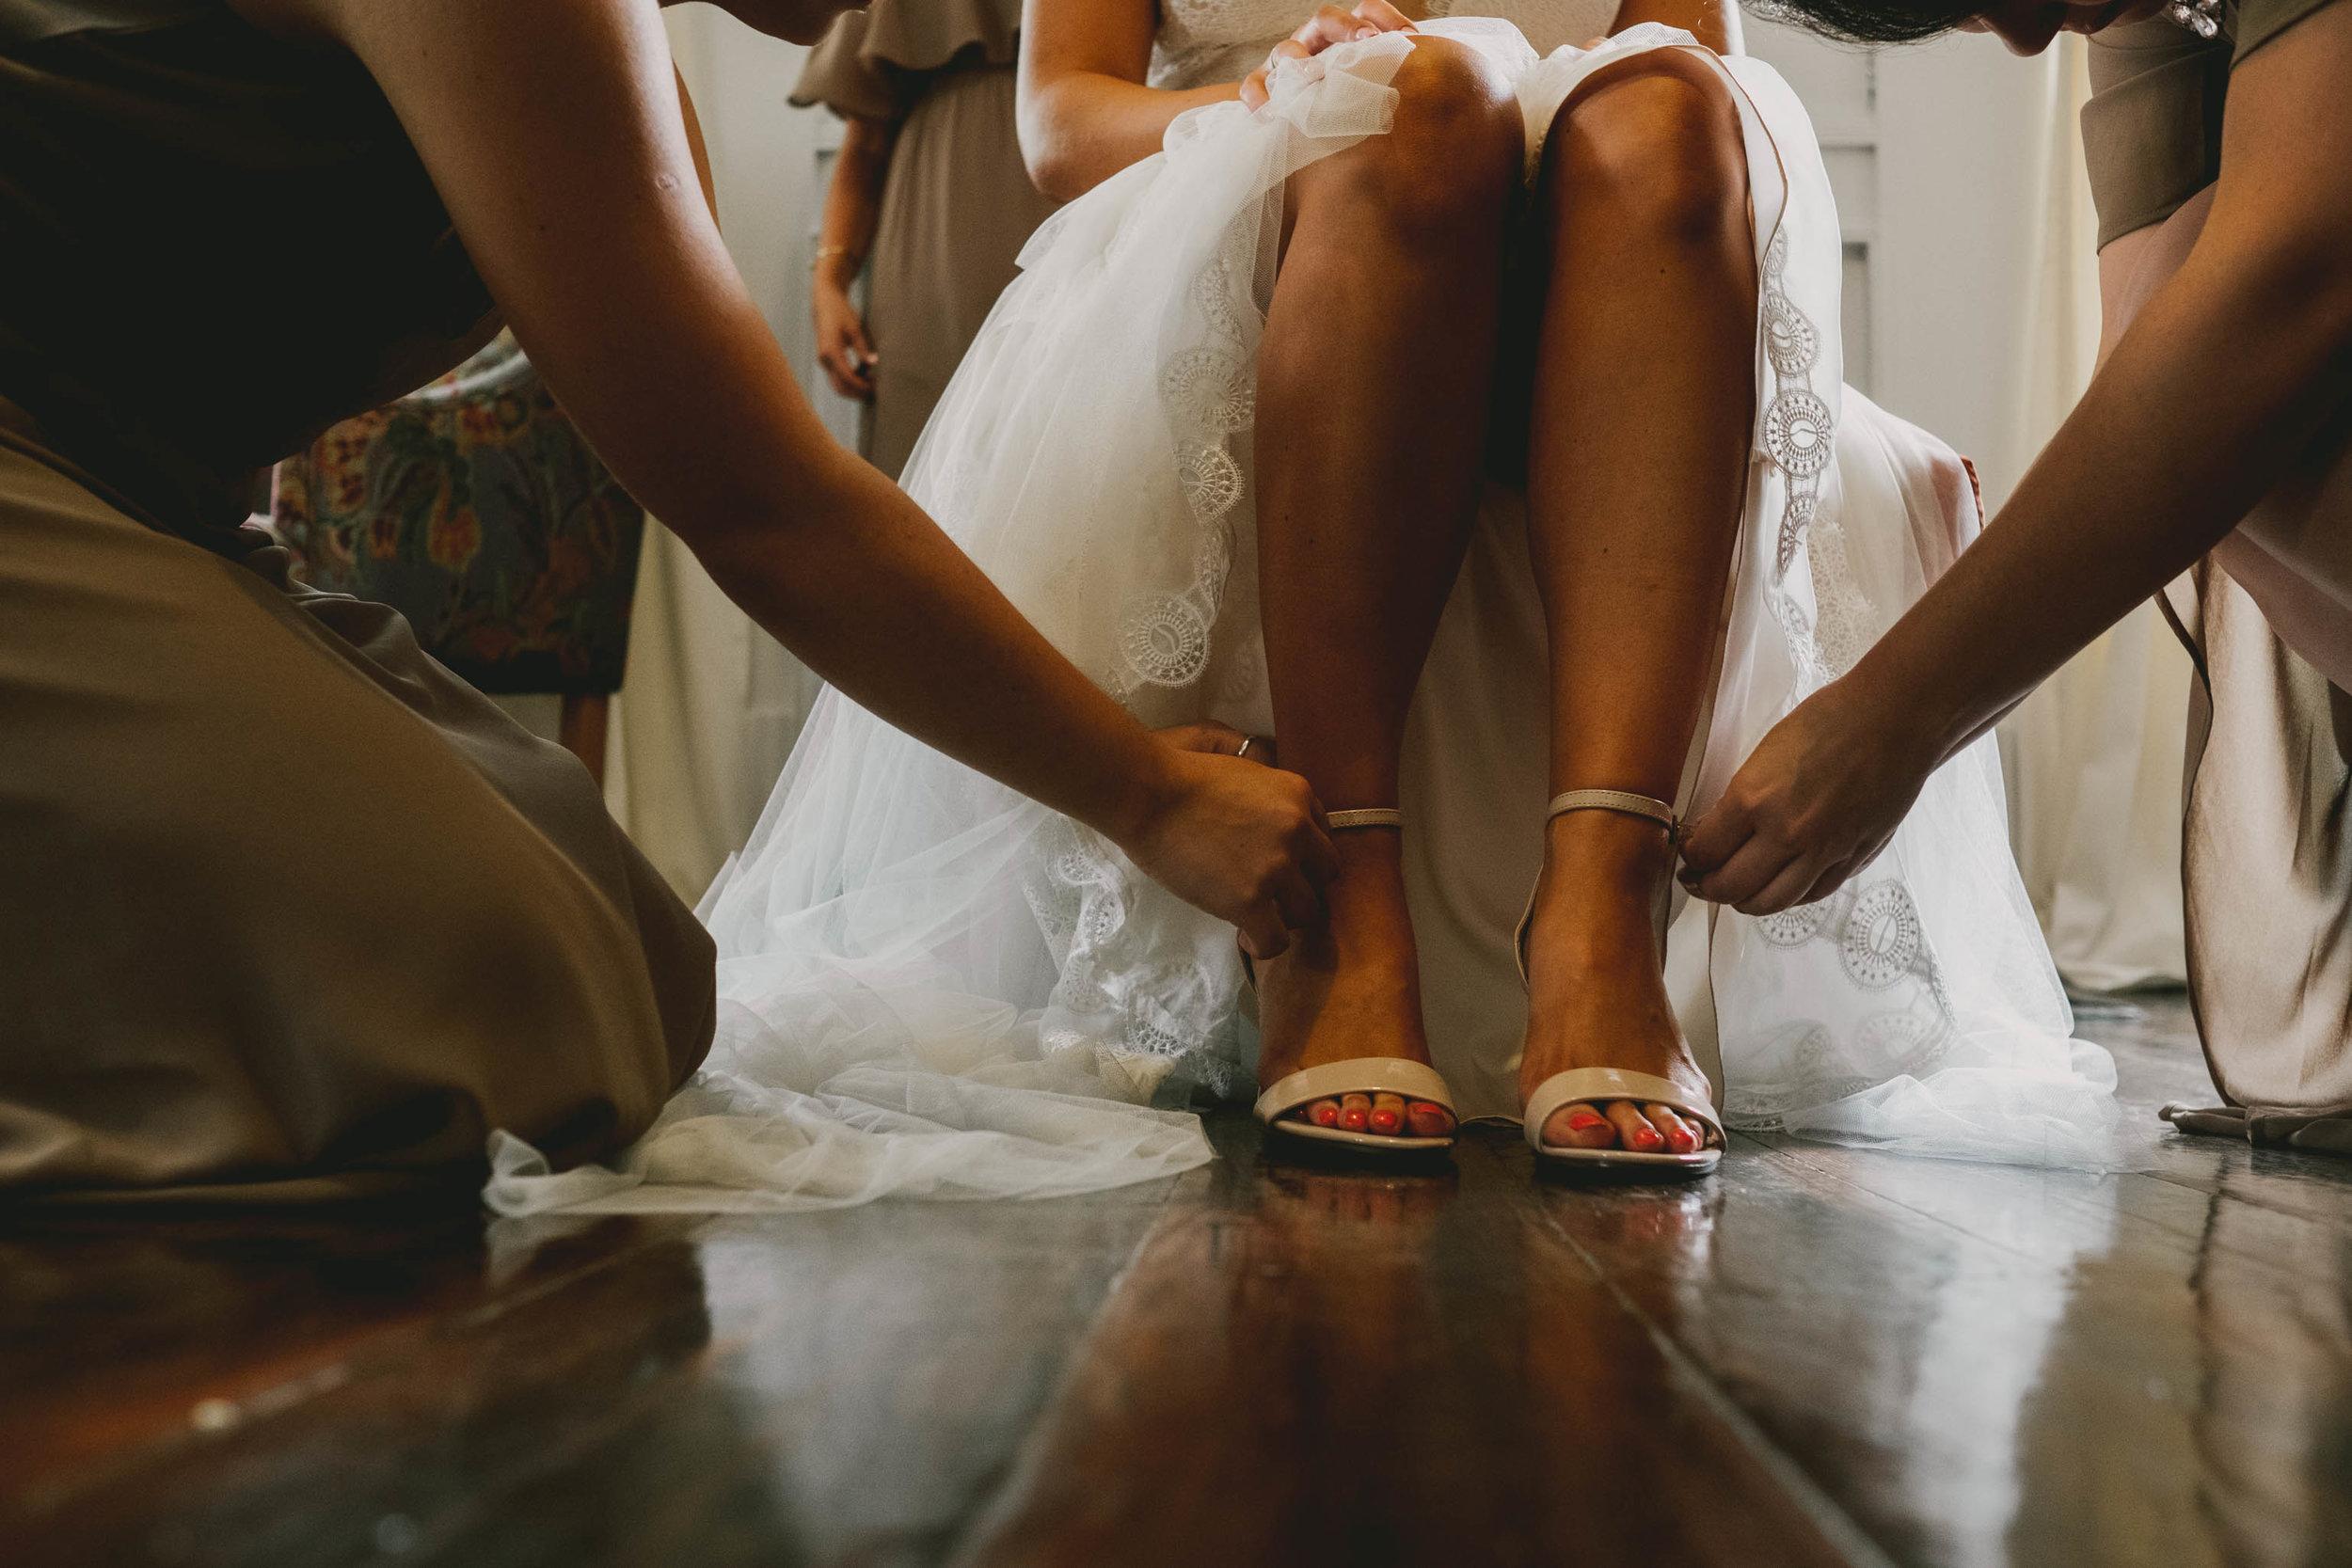 mims-house-wedding-brides-shoe-details.jpg